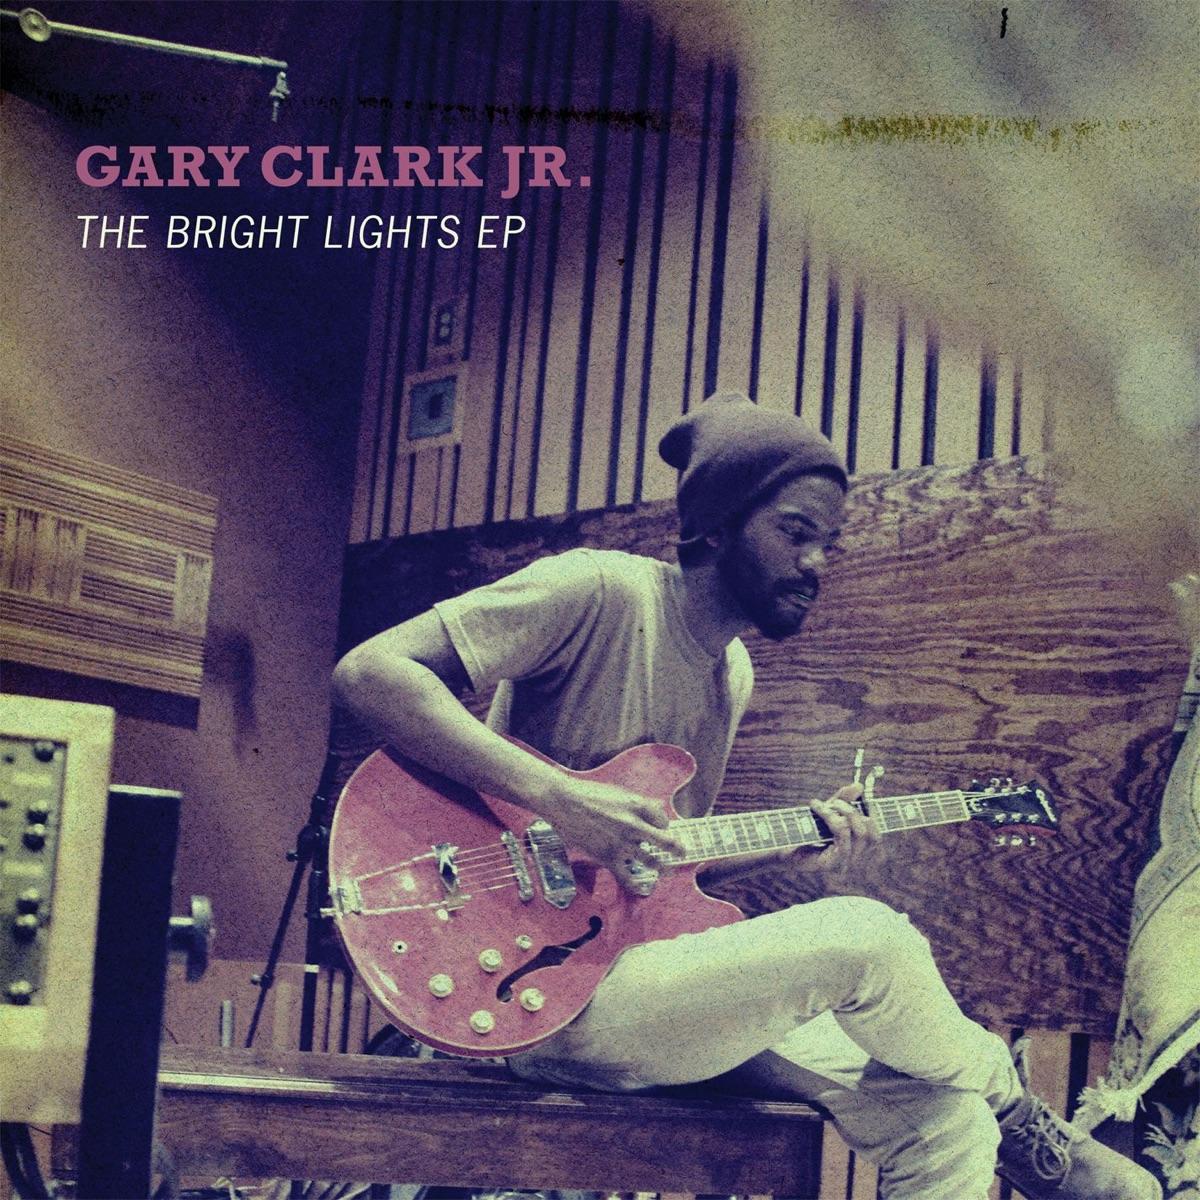 The Bright Lights - EP Gary Clark Jr CD cover